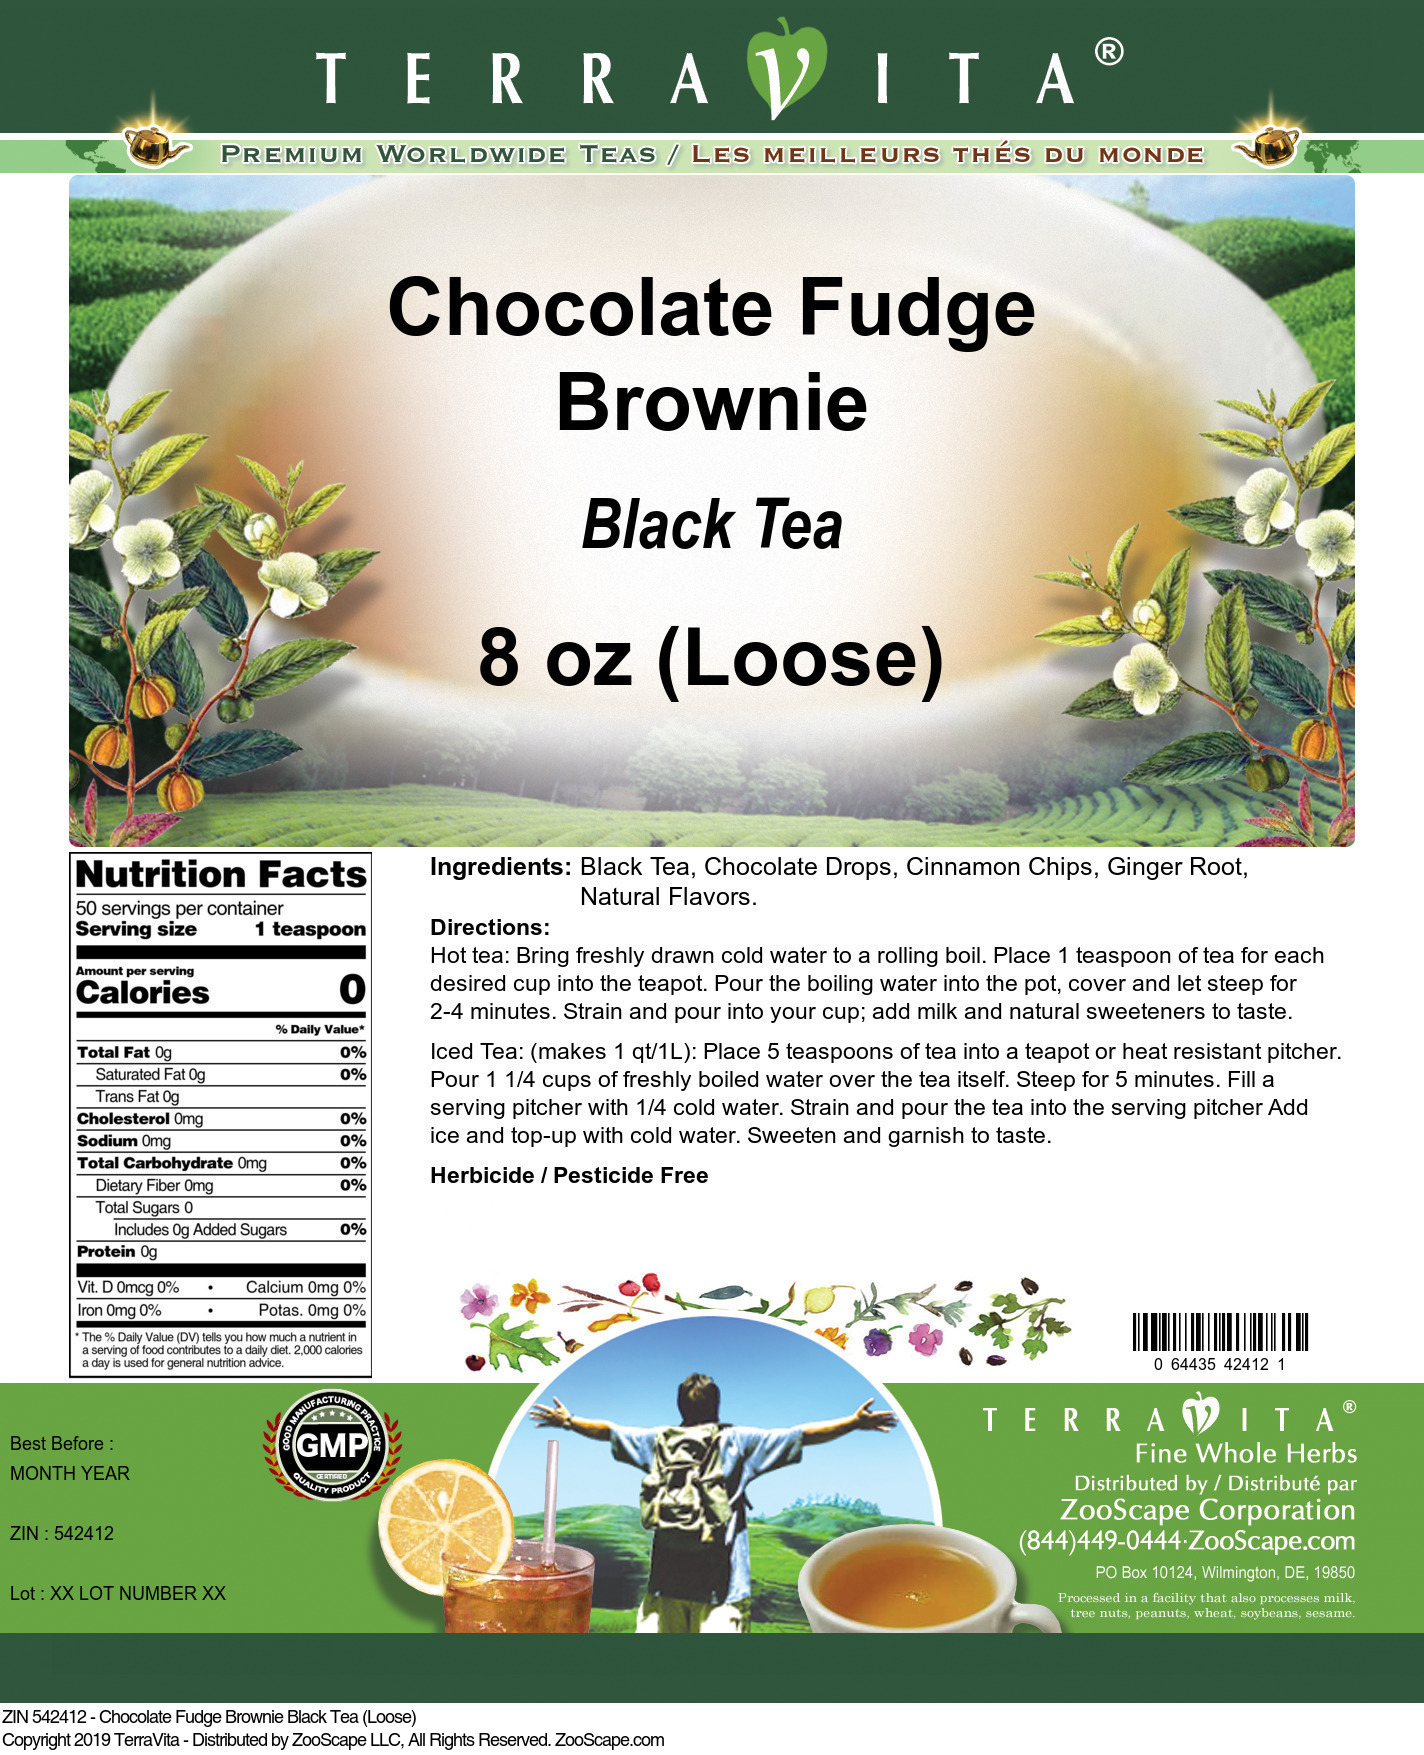 Chocolate Fudge Brownie Black Tea (Loose)